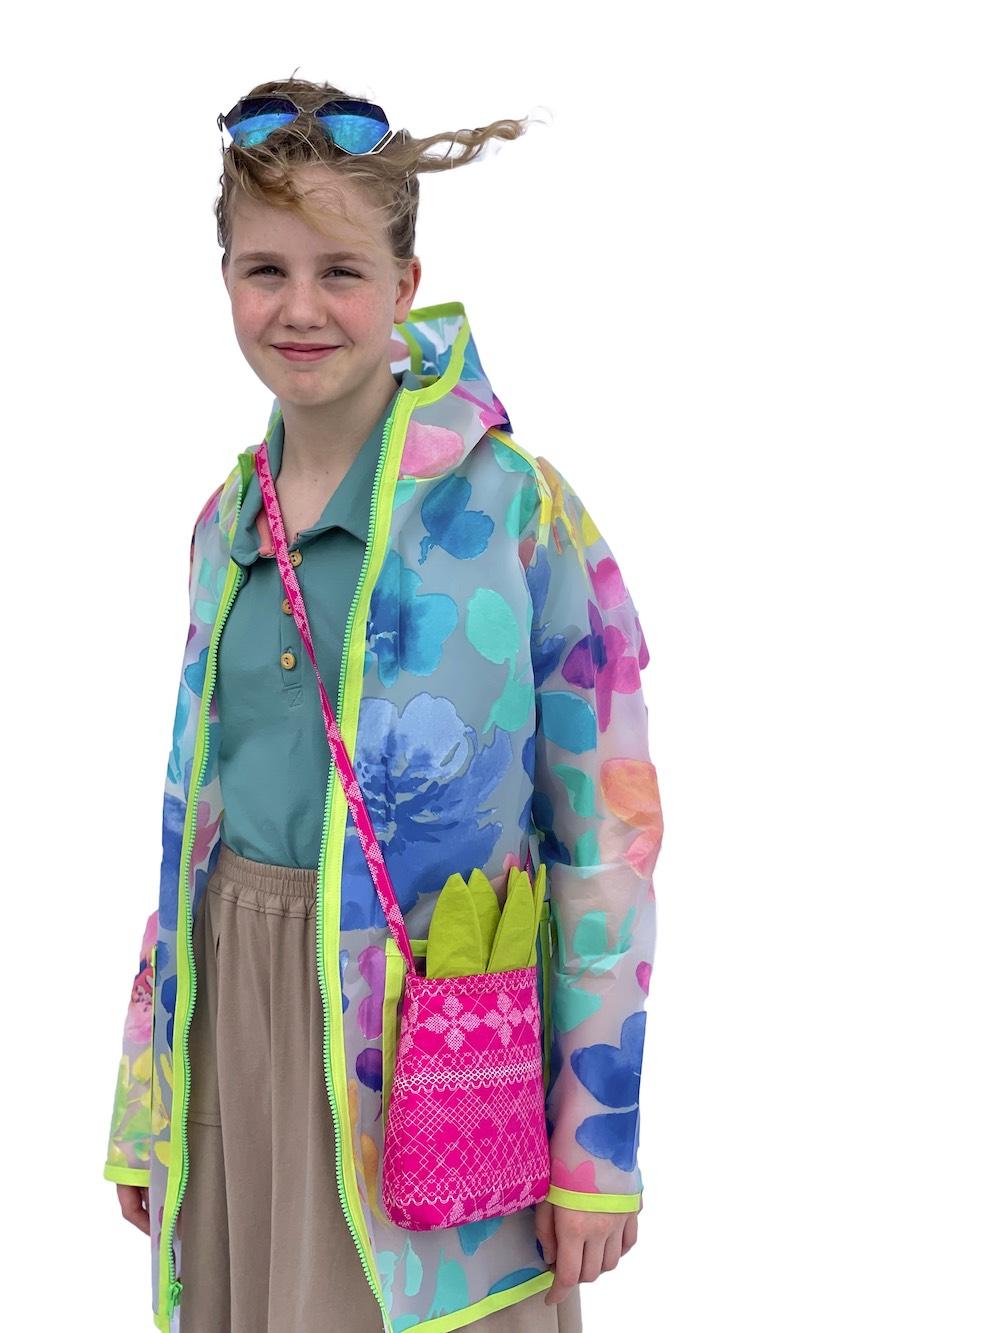 David Rain Coat sewn and reviewed by Skirt Fixation